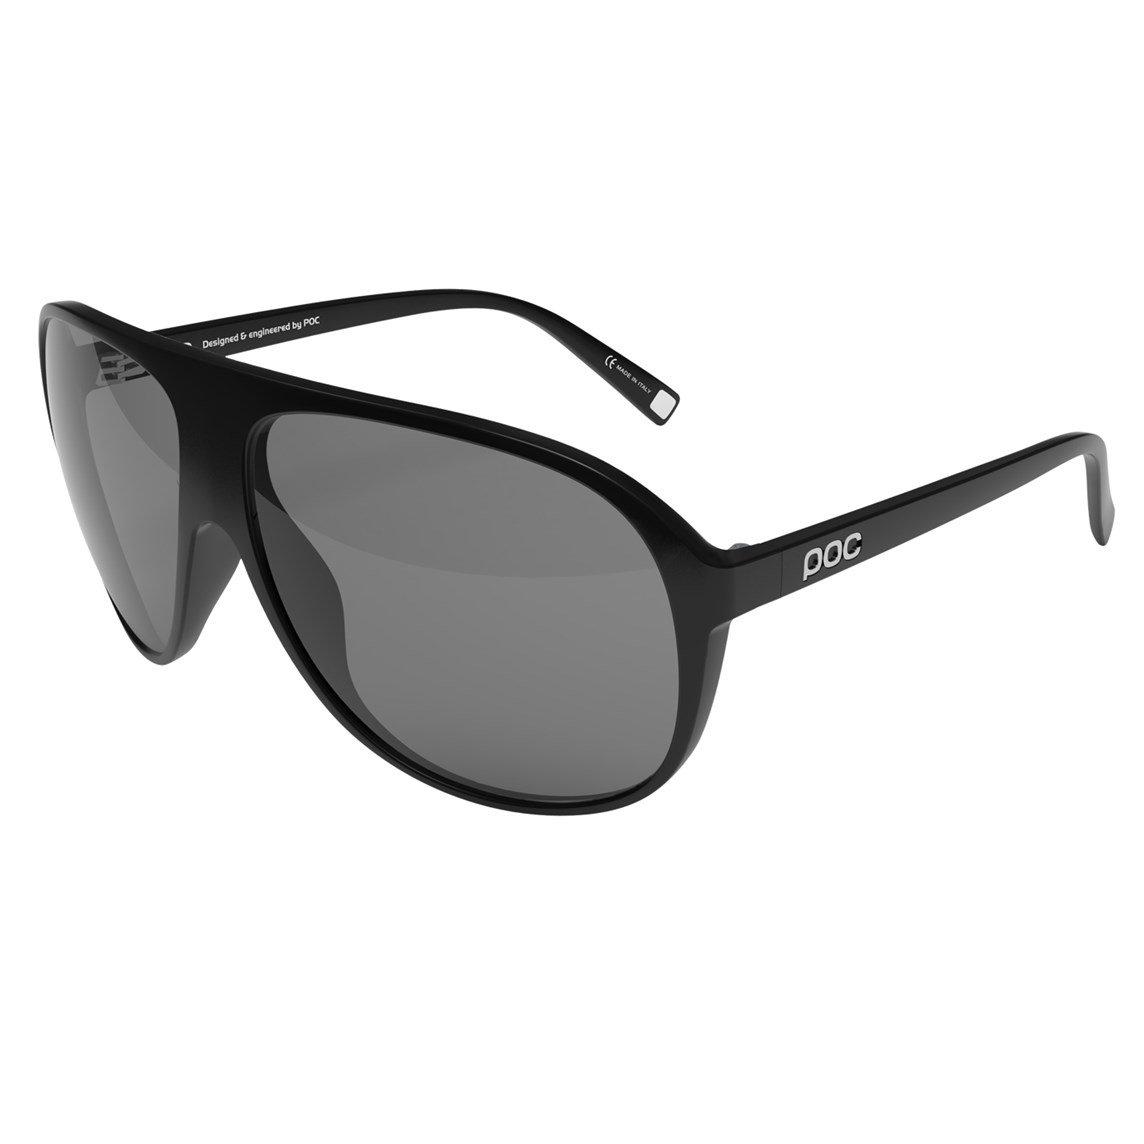 410ba4718c POC Did Sunglasses Black Uranium Black Size Standard  Amazon.co.uk  Sports    Outdoors